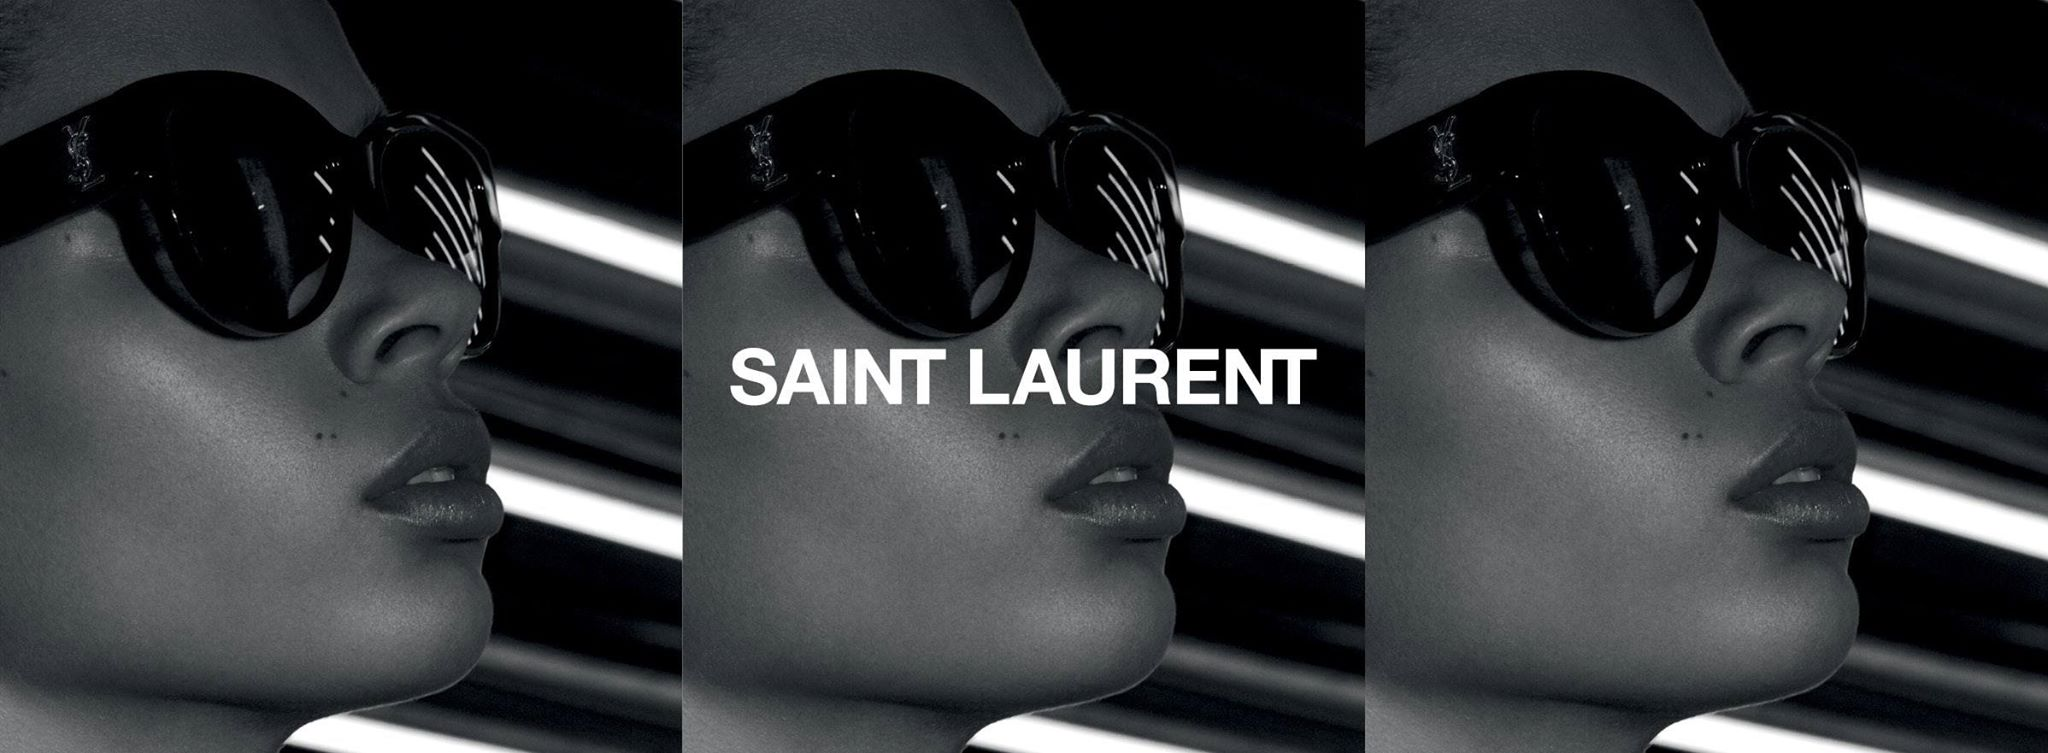 Hedi Sliame為Saint Laurent Paris 拍攝眼鏡廣告。source from YSL.com